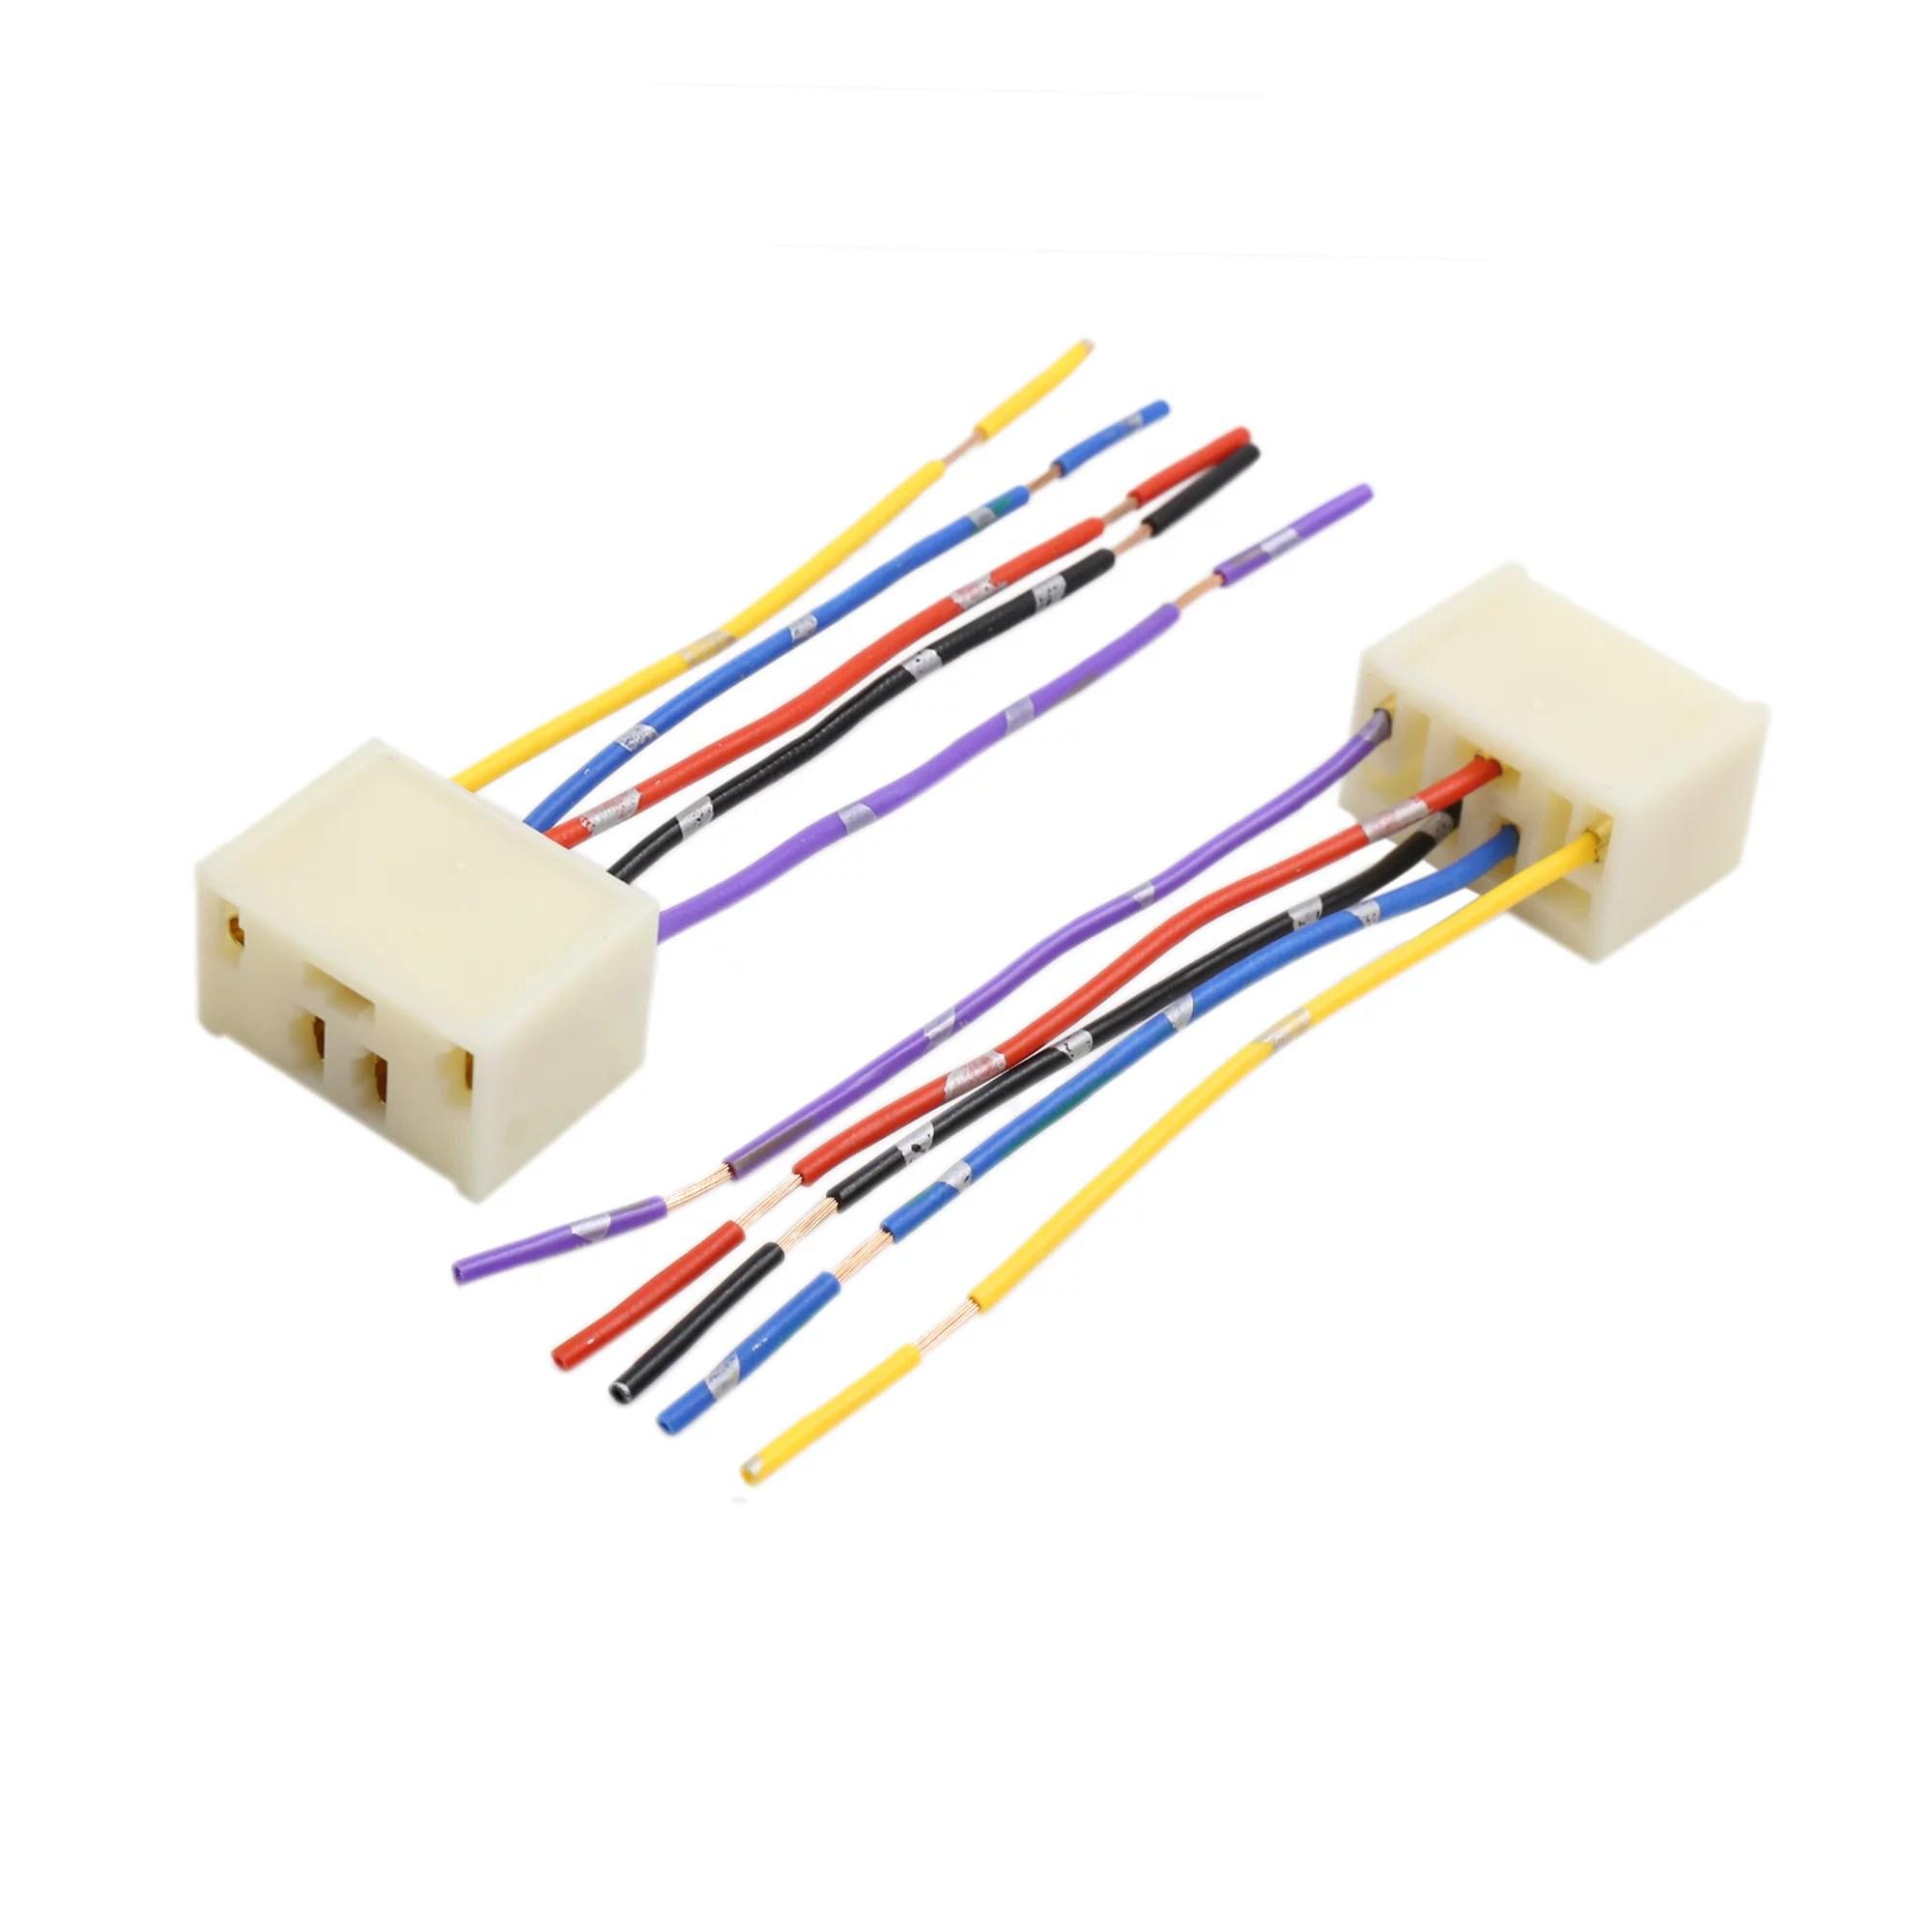 4pcs dc 12v 5 pin car power window switch socket wiring harness plug 3 wire harness repair window [ 2000 x 2000 Pixel ]